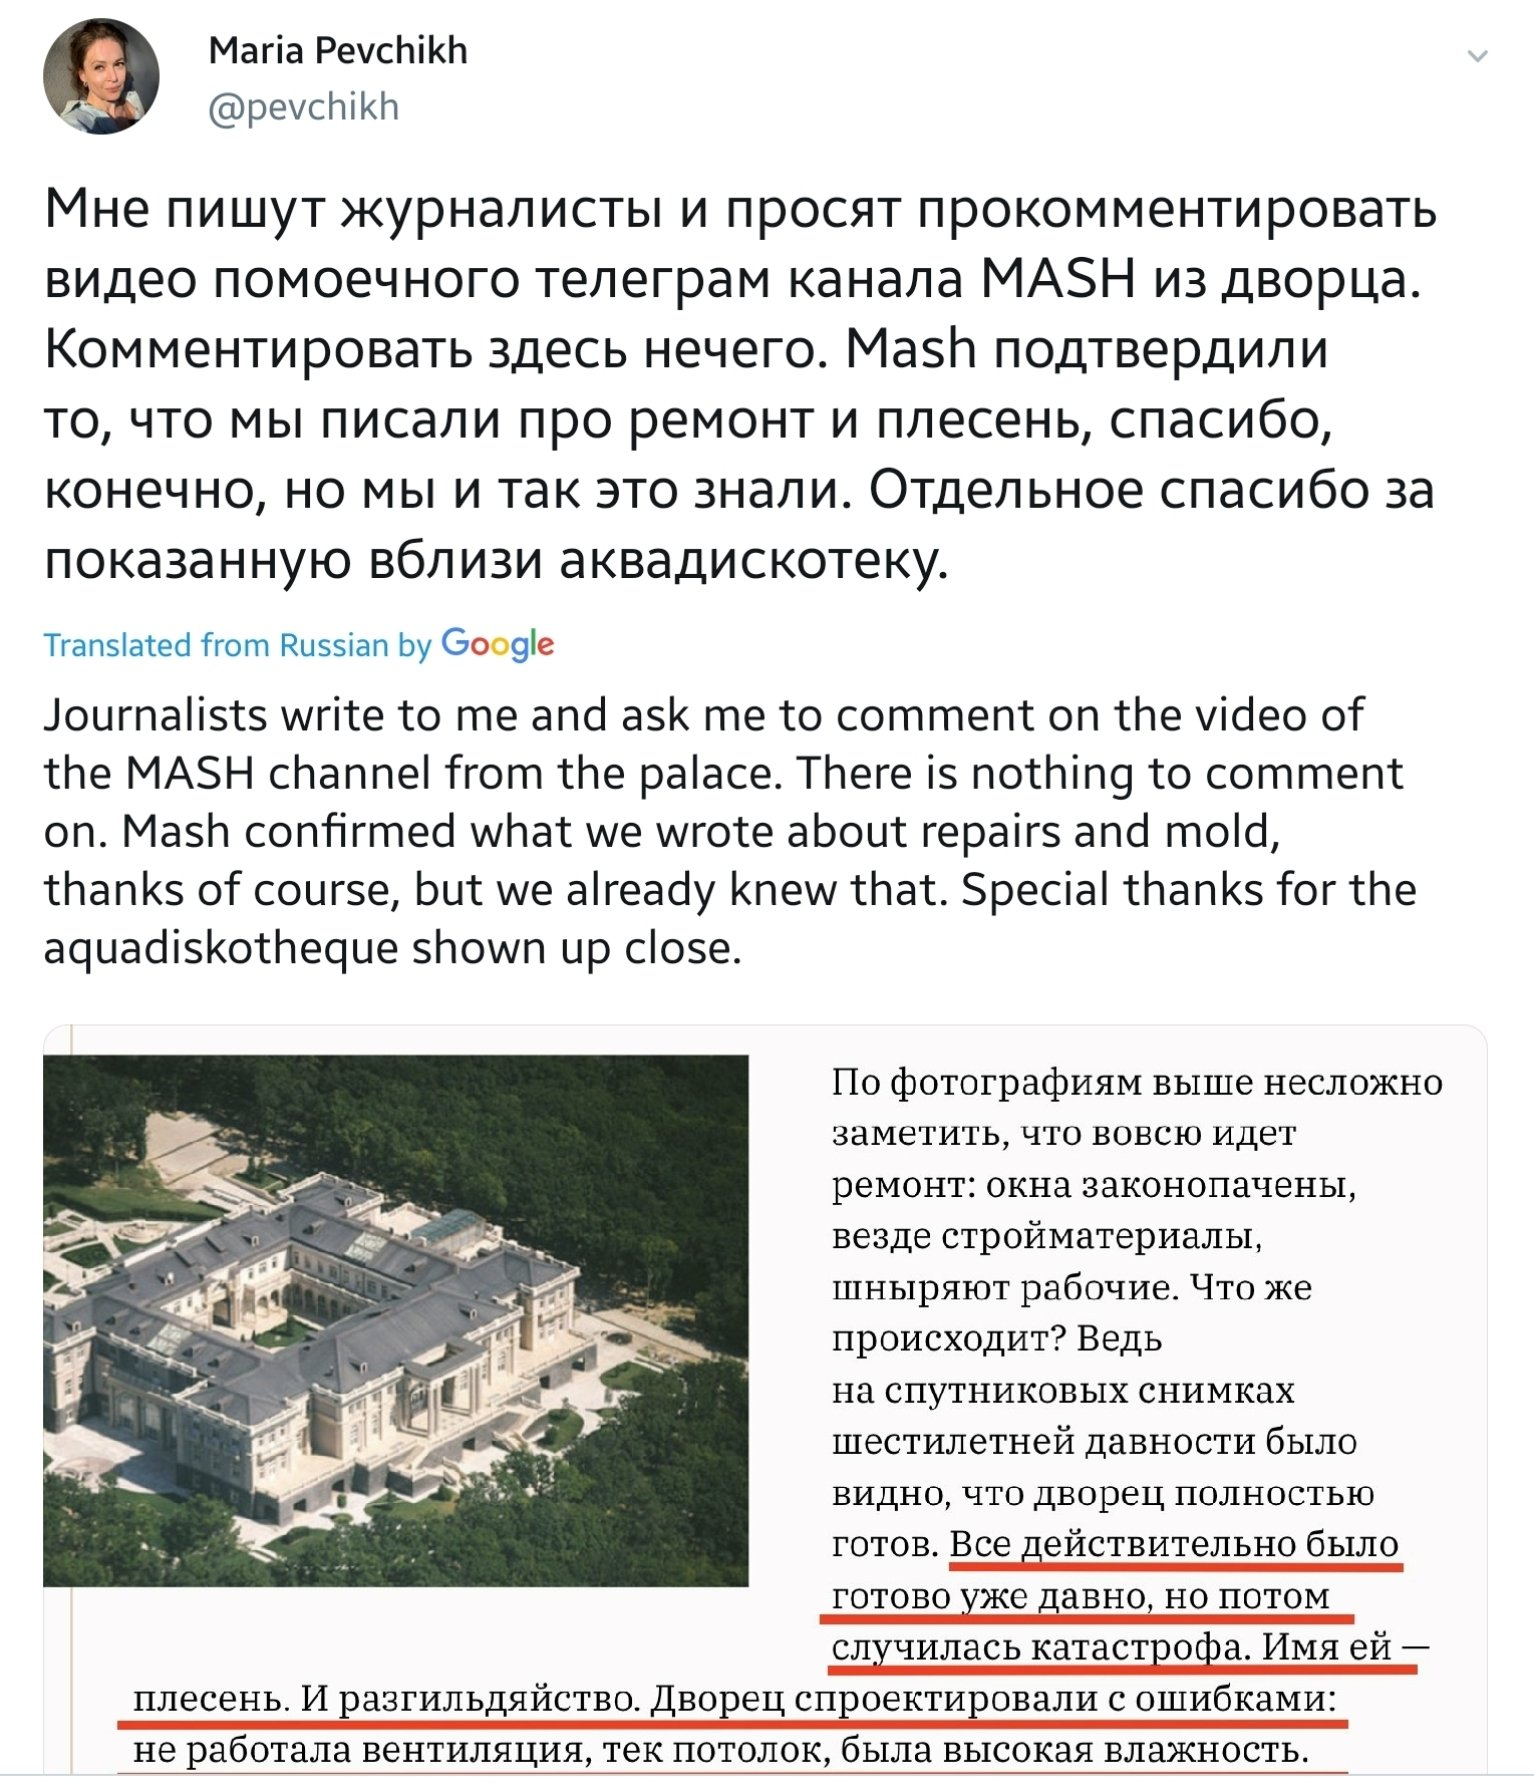 Post de Maria Pevtchikh